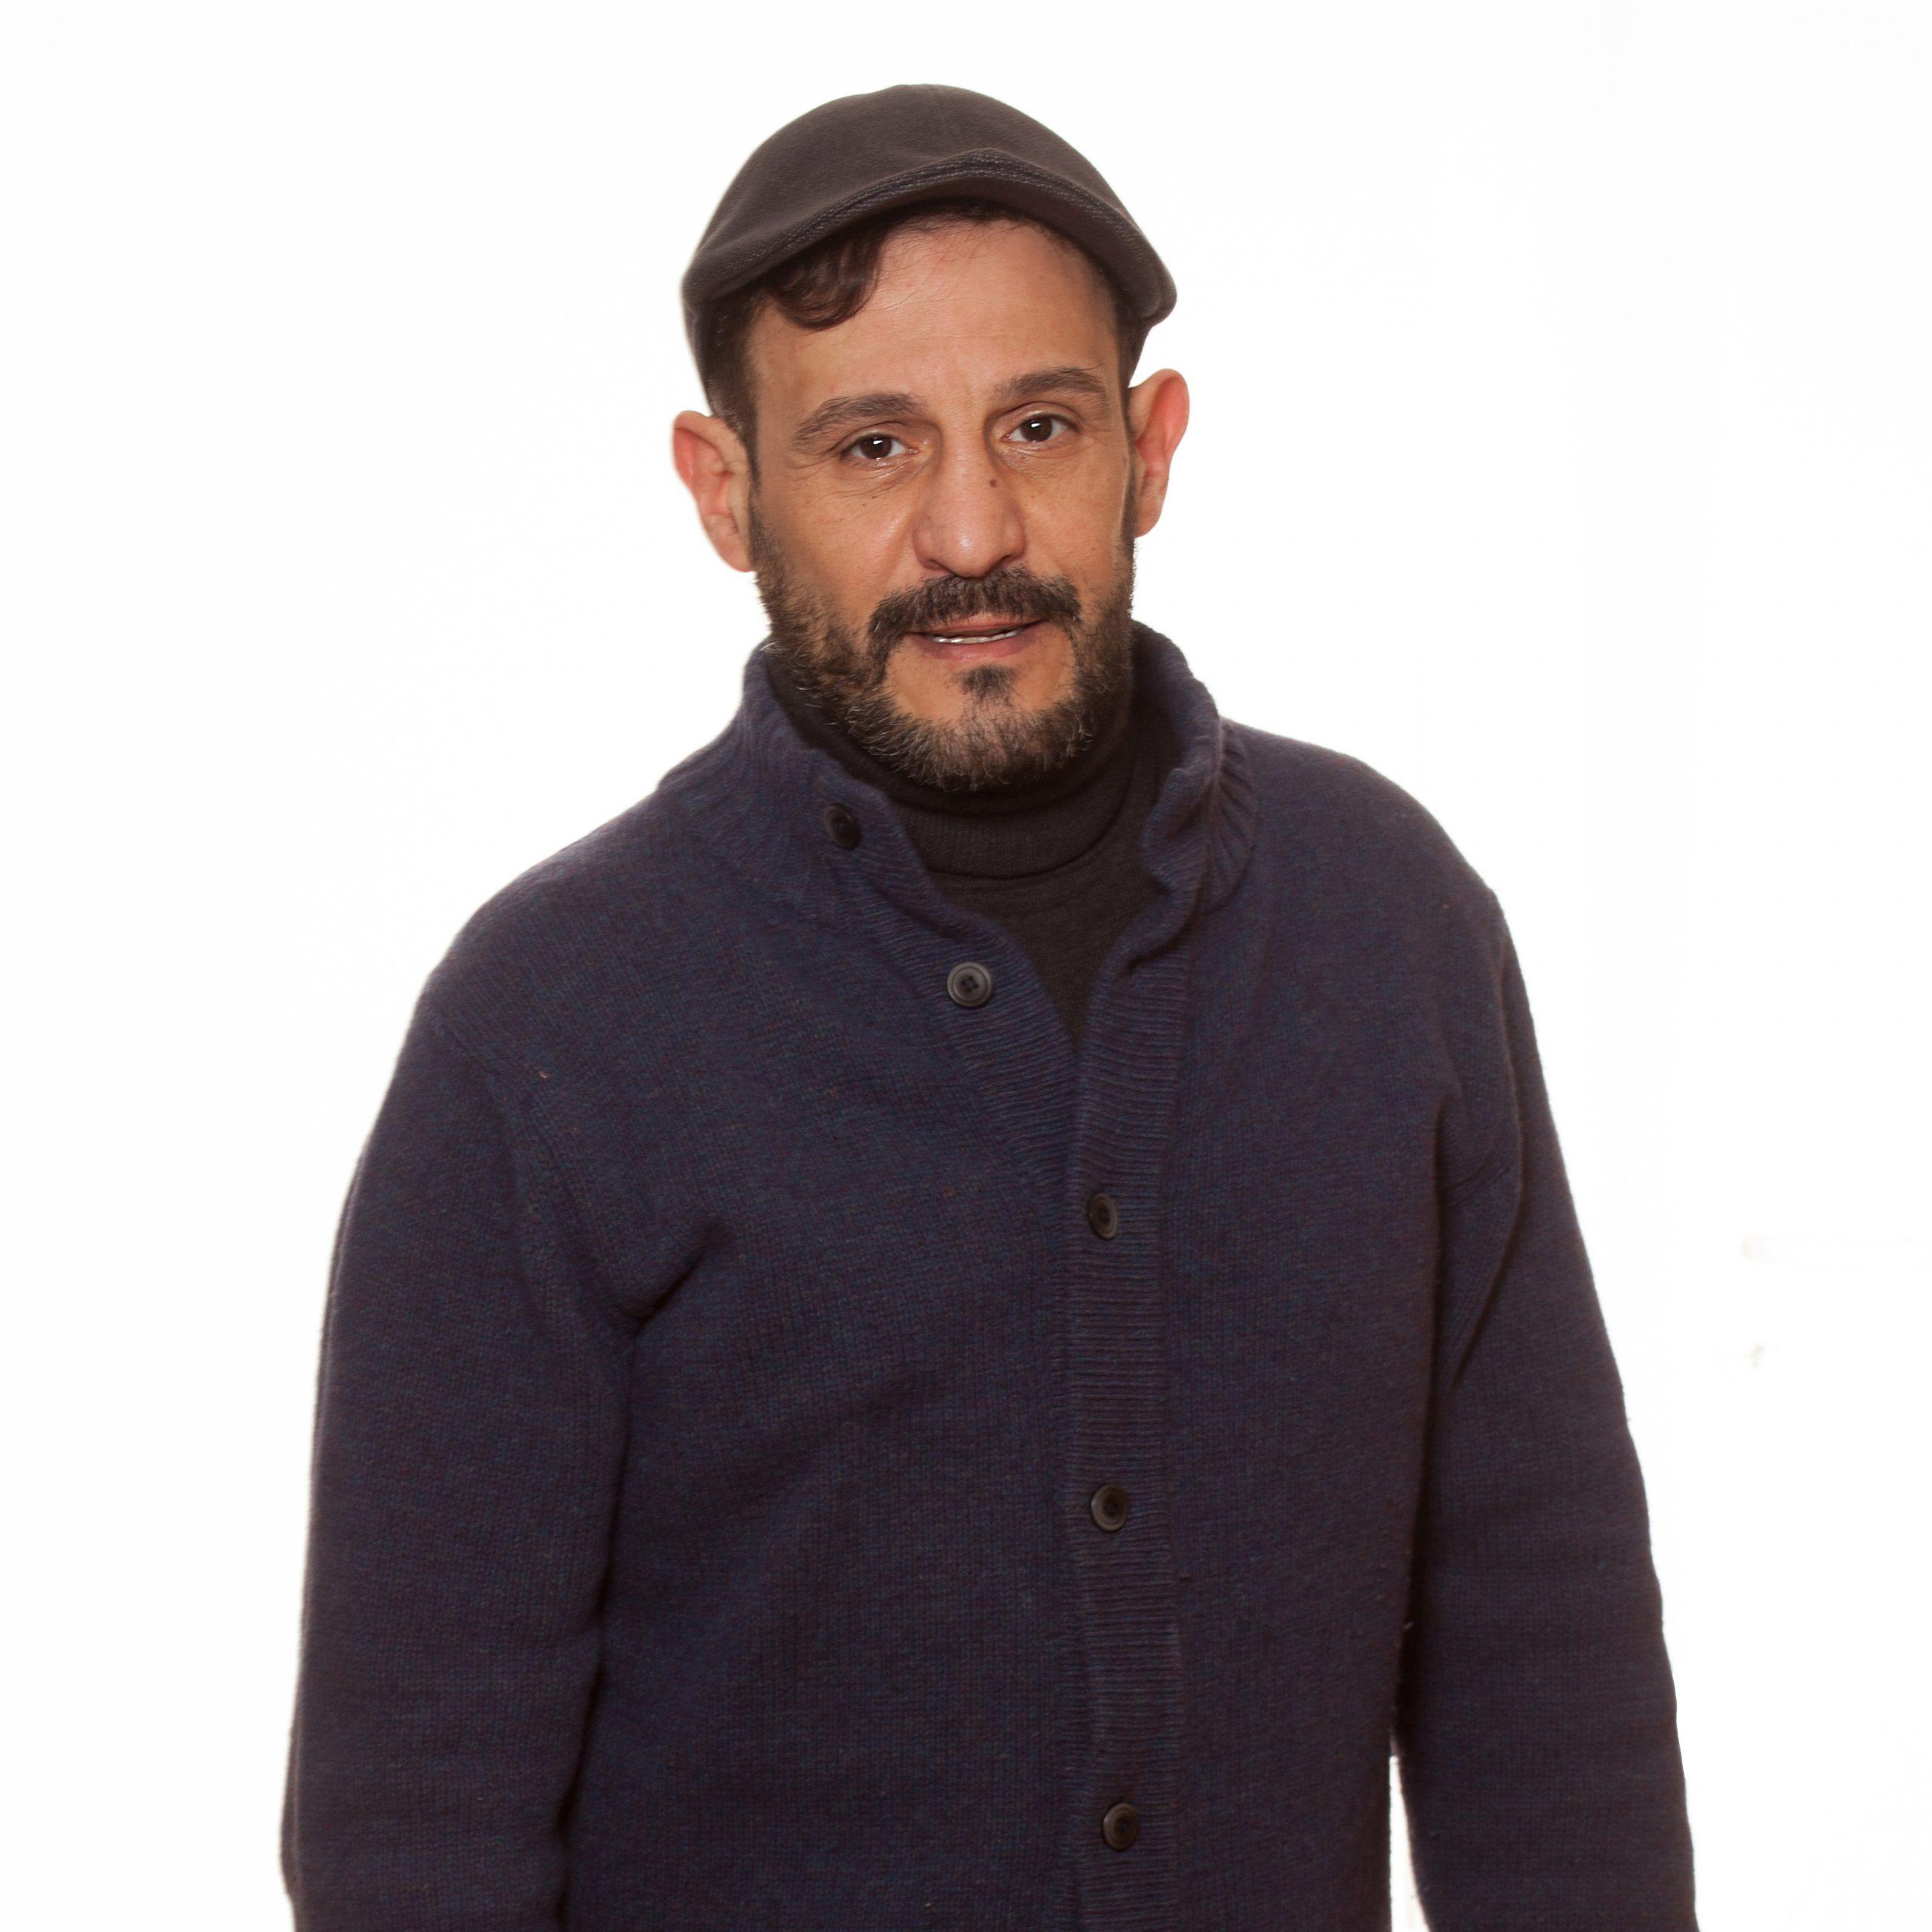 Hassan, Bénévole